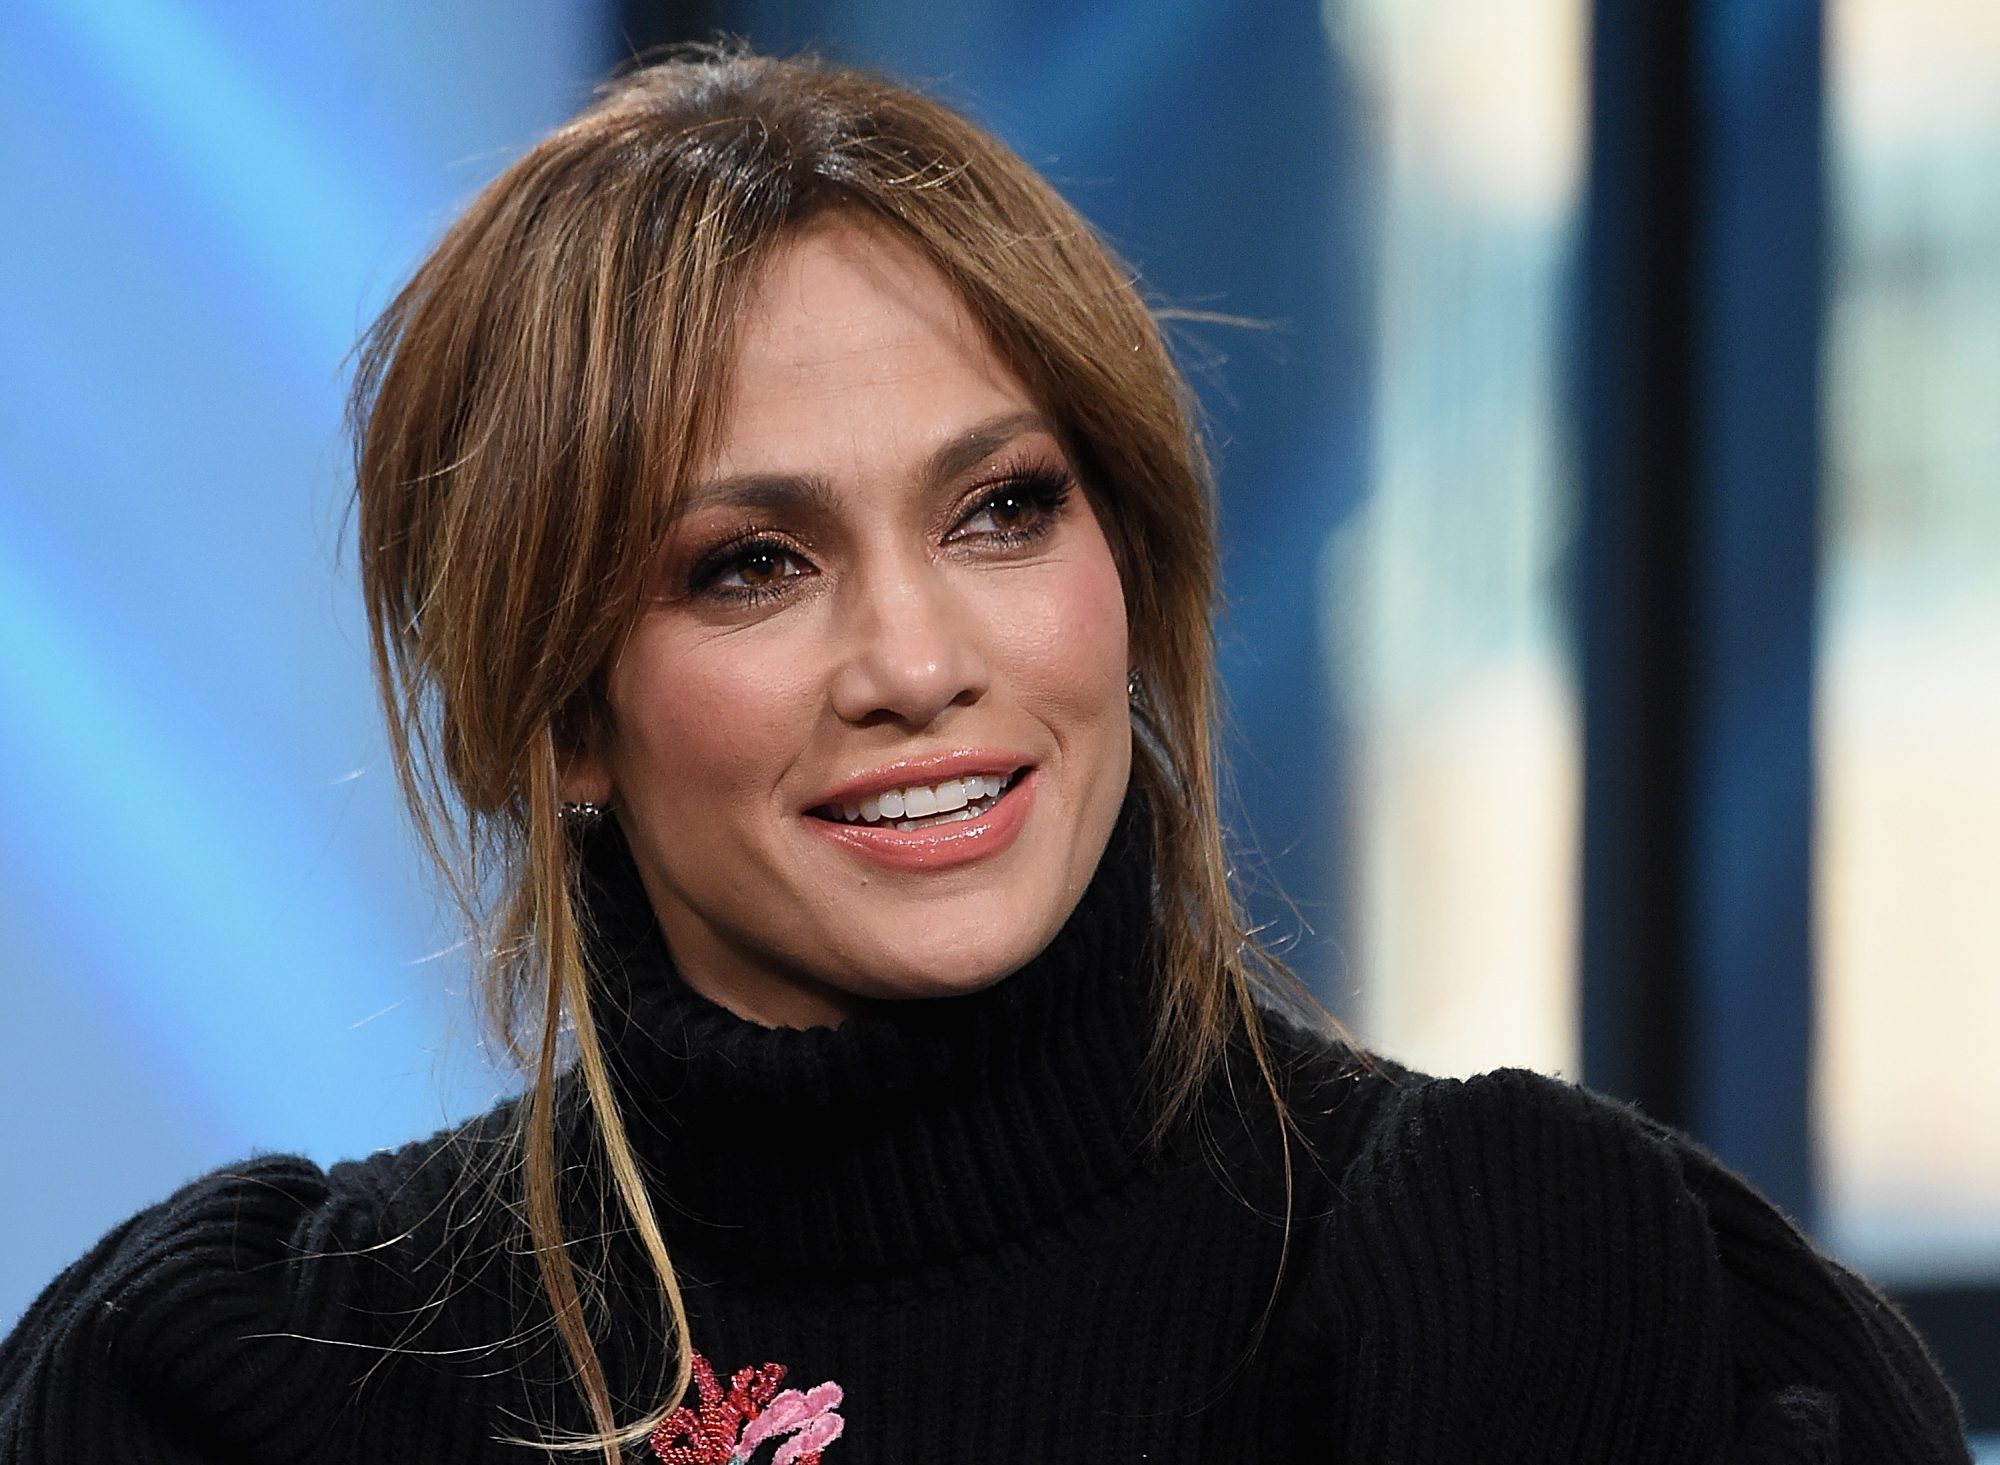 Jennifer Lopez Shares a Makeup-Free Selfie